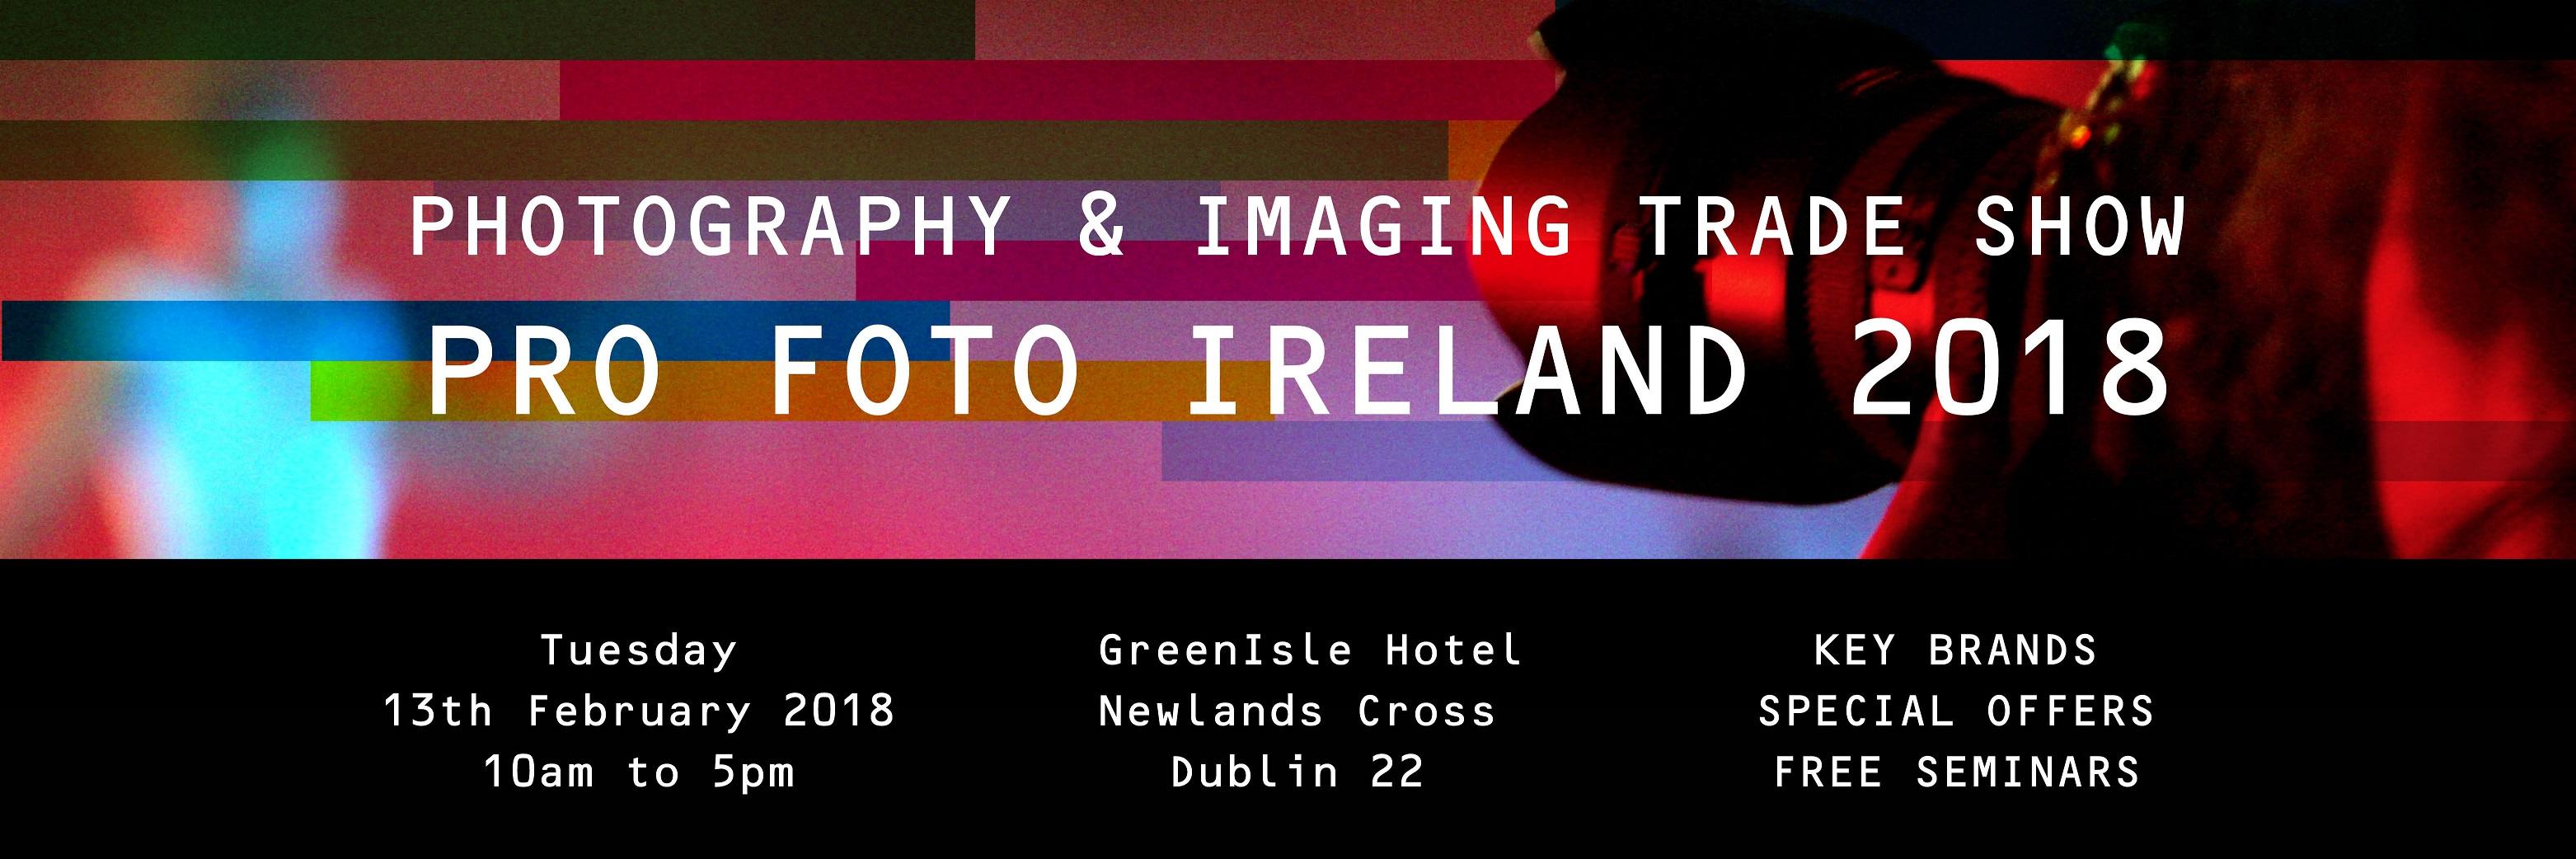 Pro Foto Ireland 2018